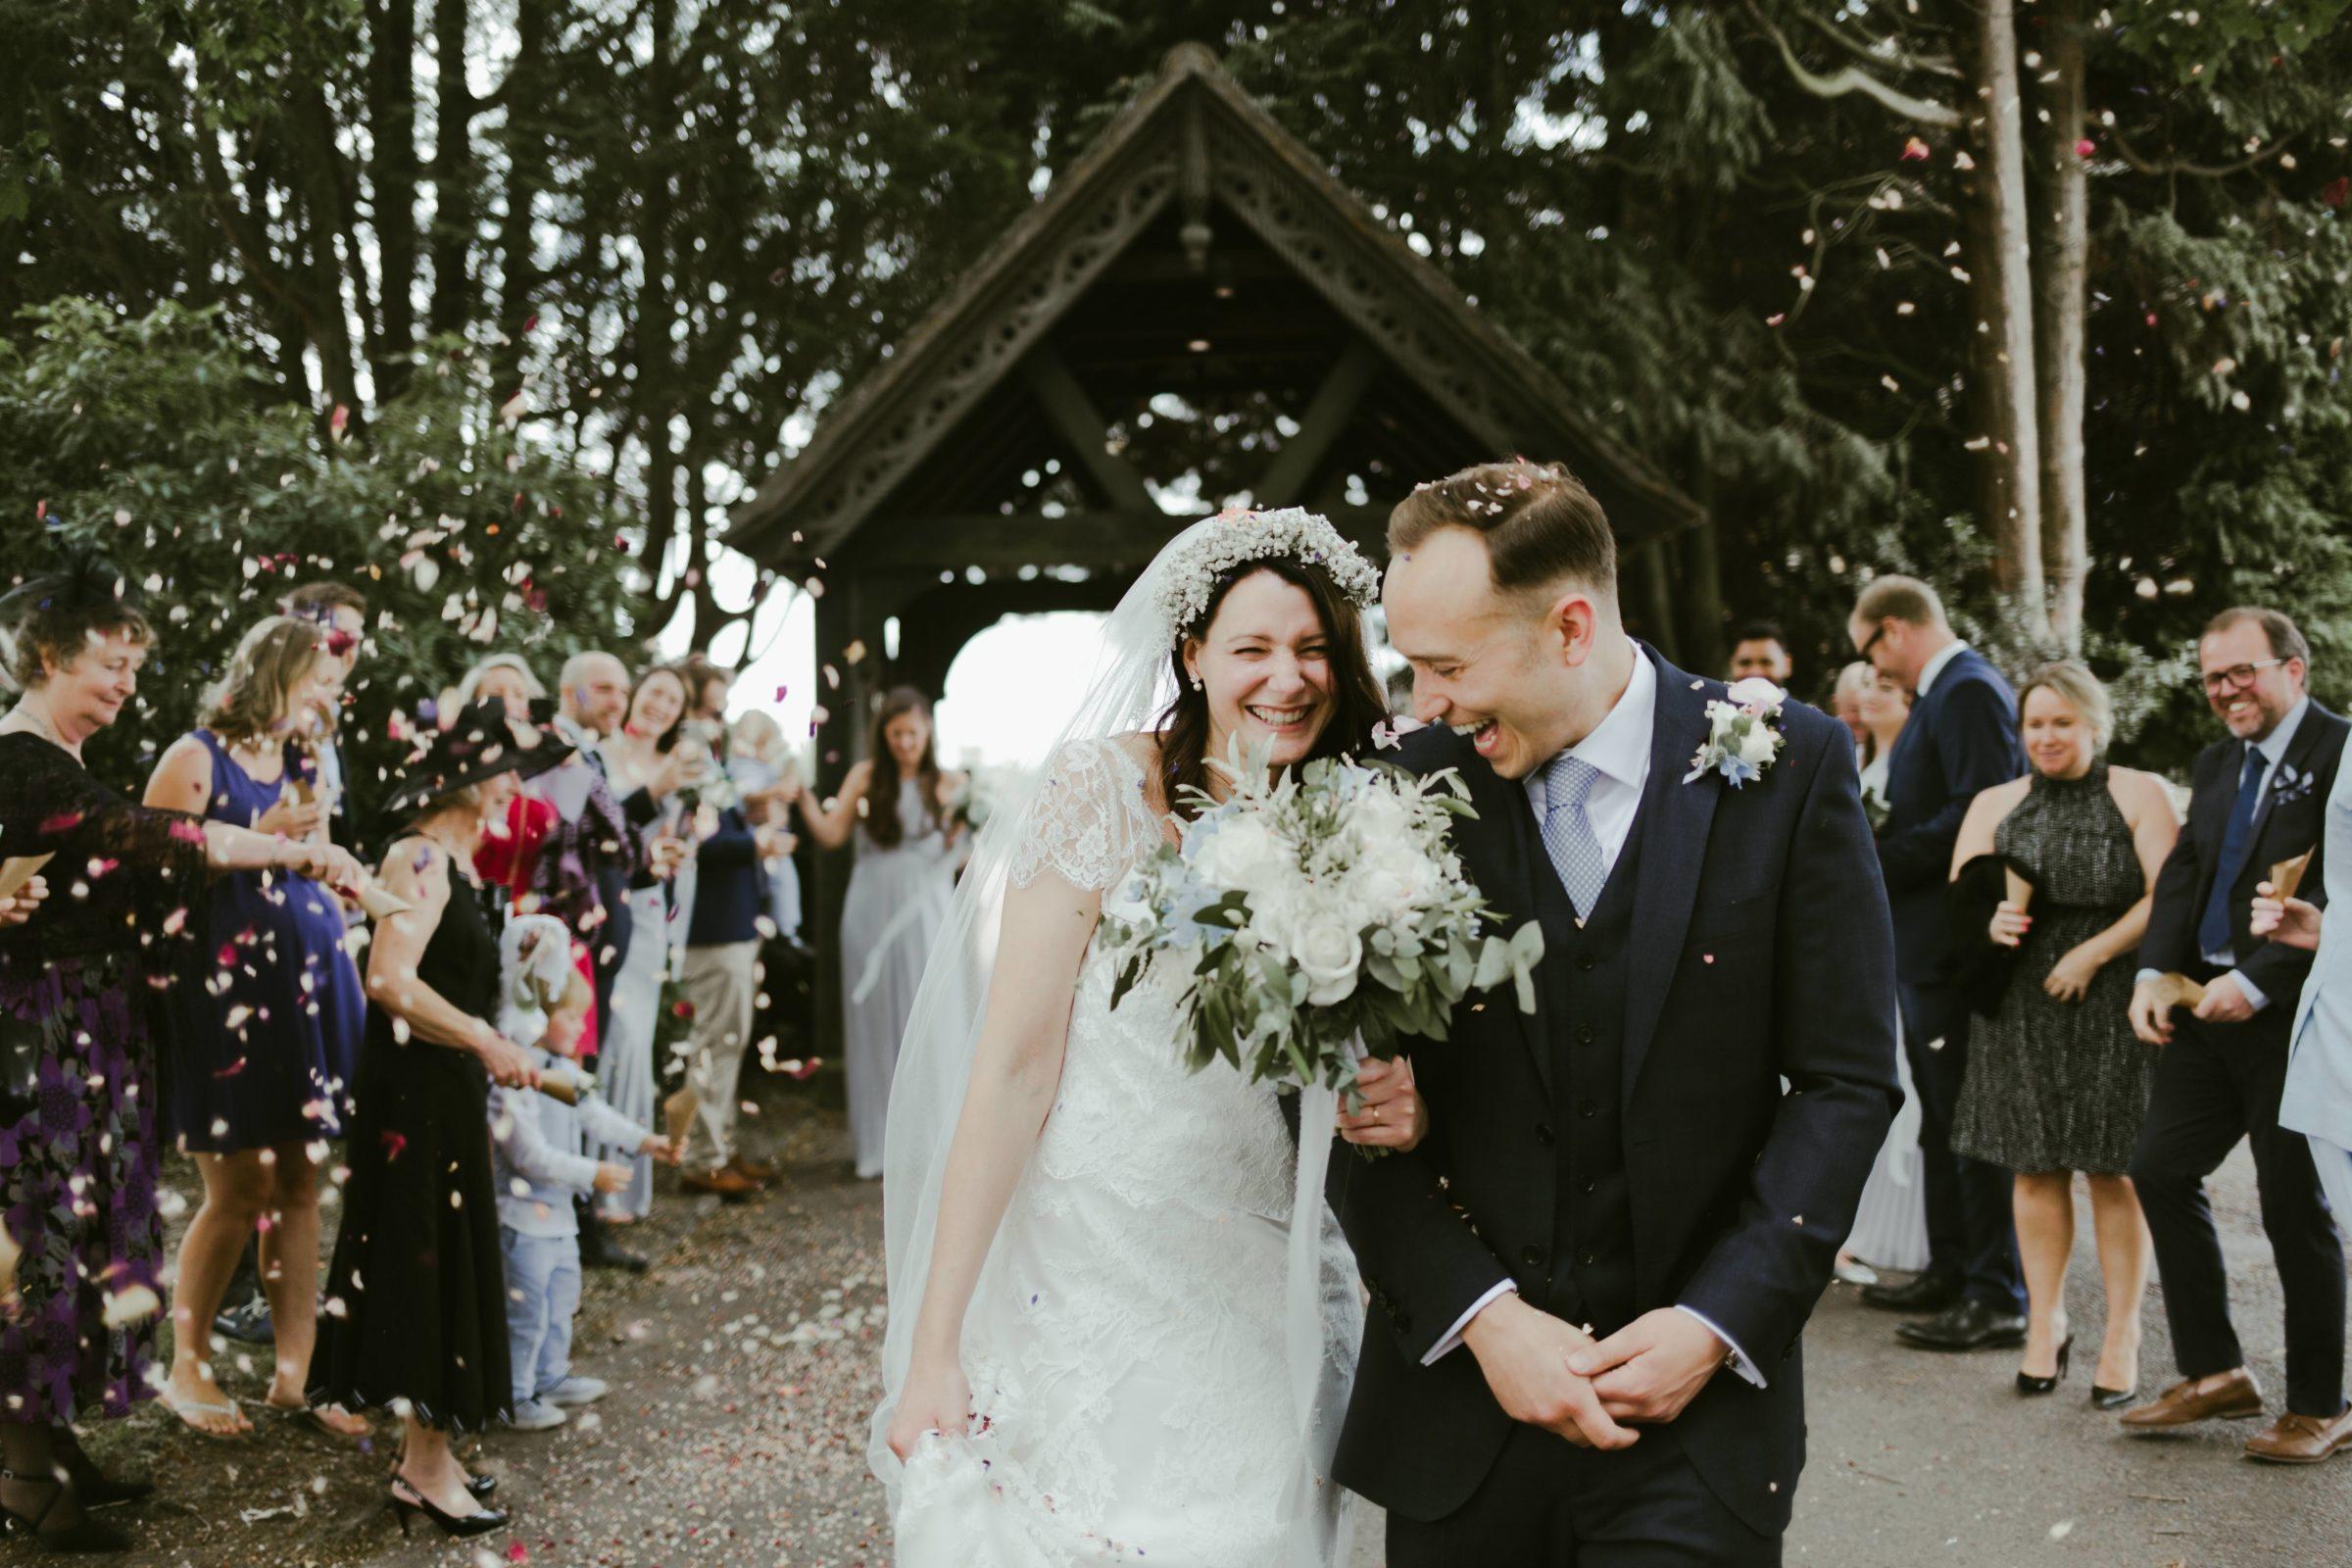 church-wedding-wedding-photography-photographer-surrey-uk-ramster-hall-venue-south-east